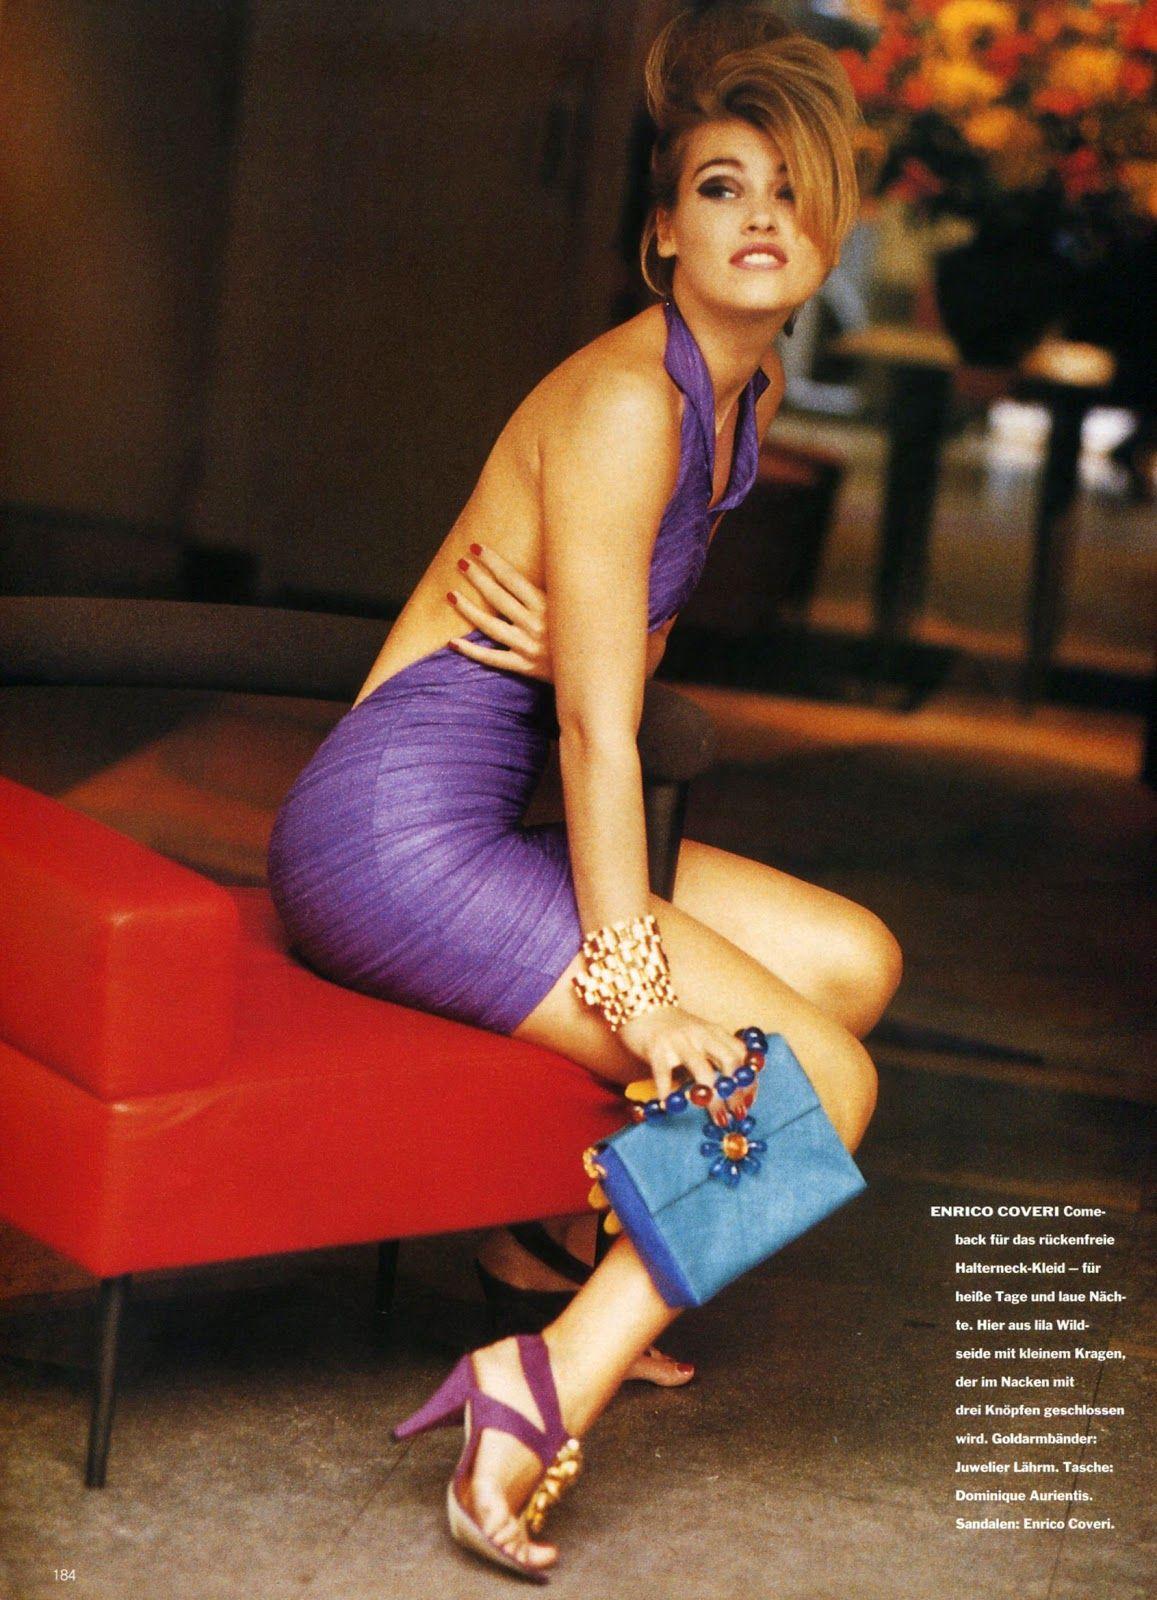 Vogue (Germany) January 1991 | Sommer-News 03.jpg